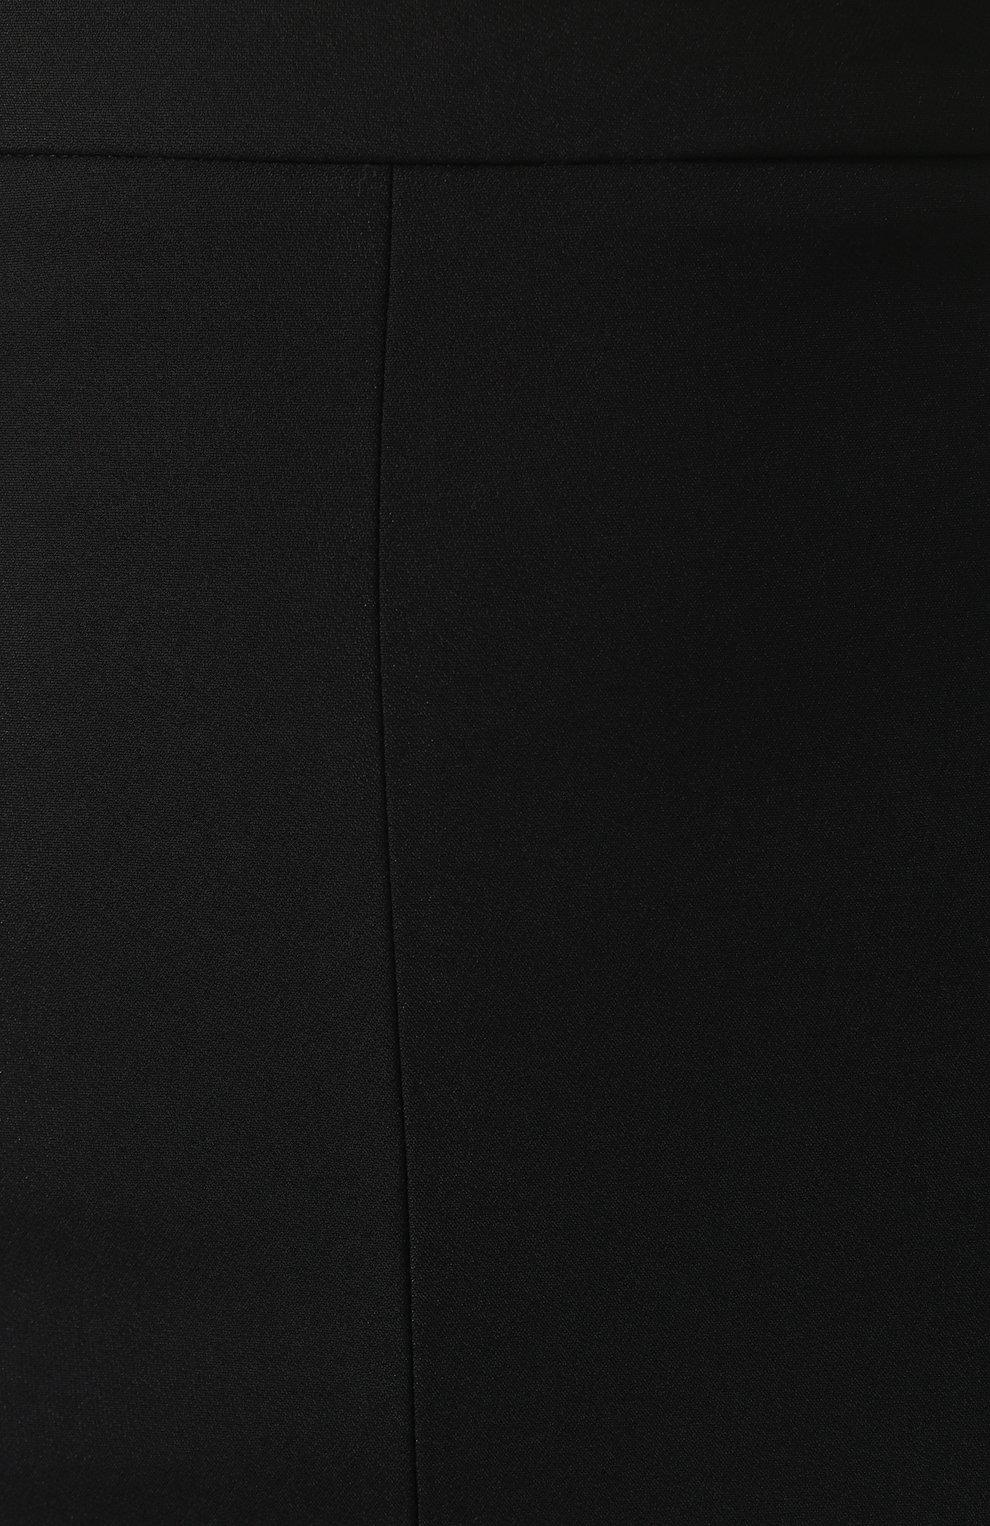 Юбка из смеси шерсти и шелка | Фото №5